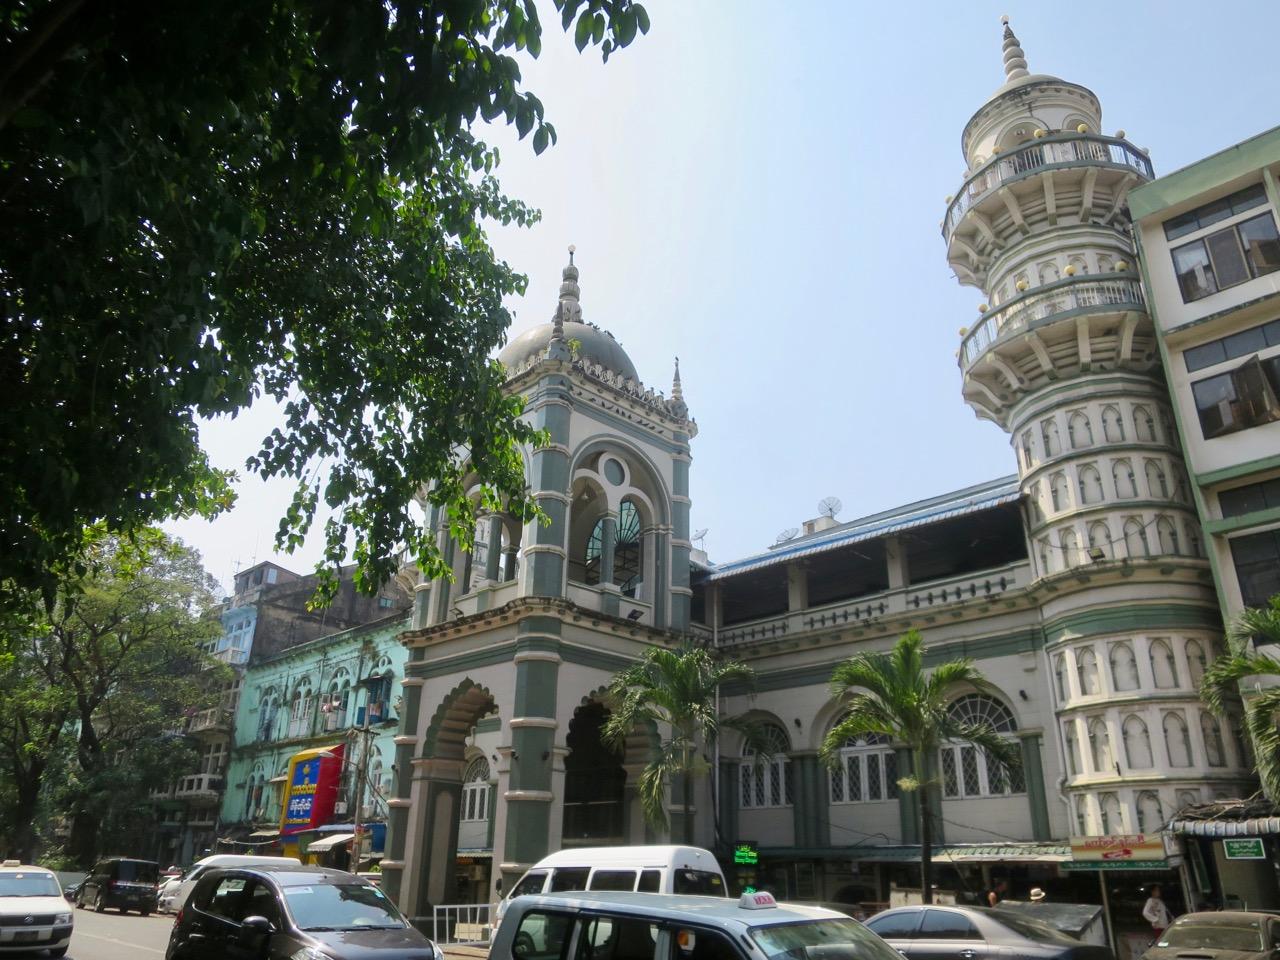 Onibus em Myanmar 1 11